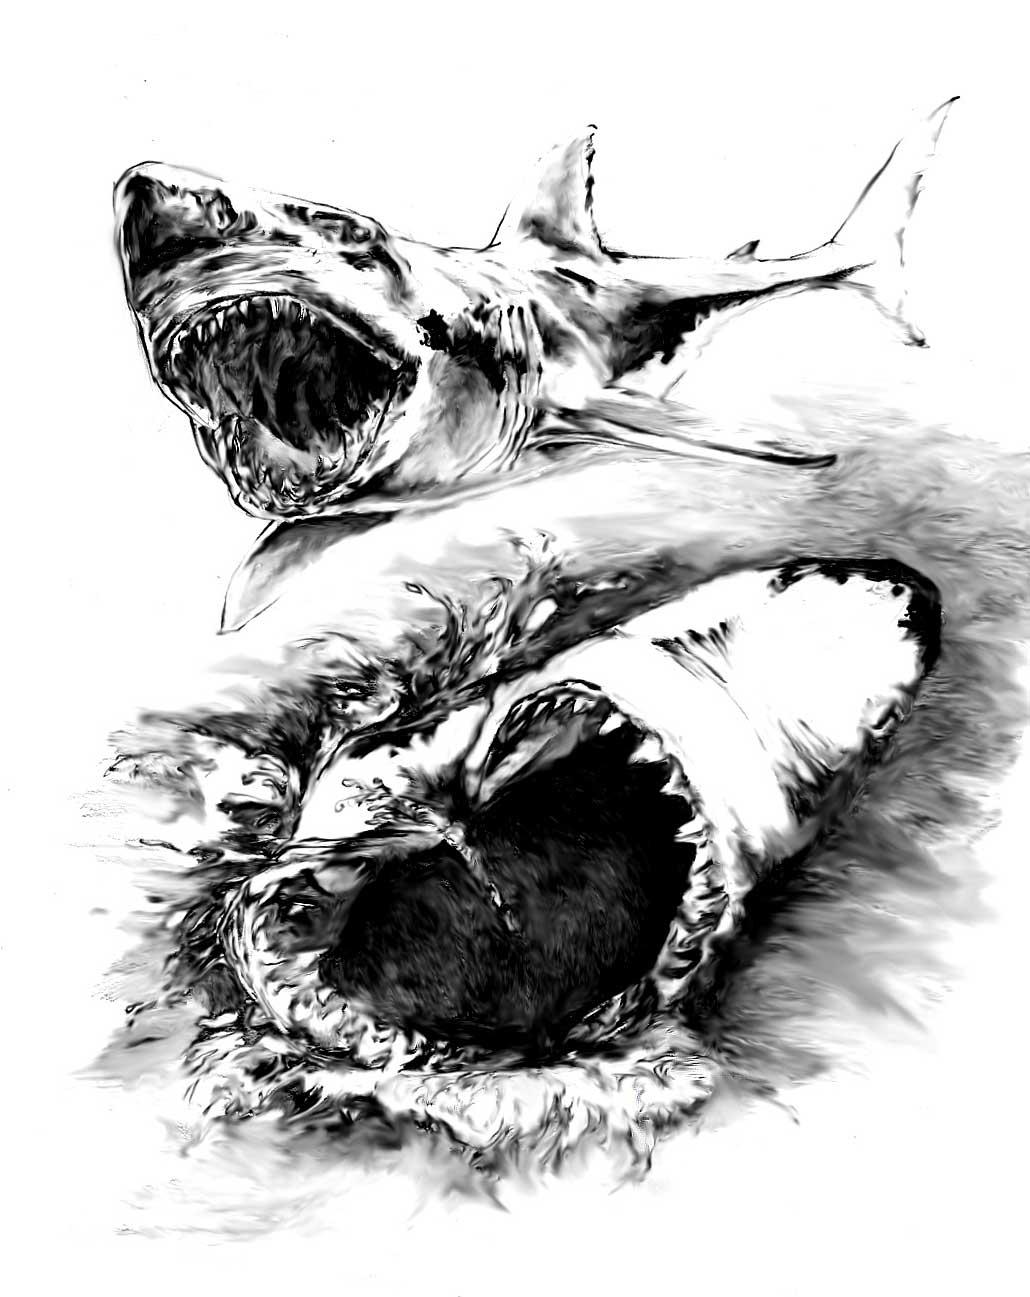 Realistic Shark Drawing Shark-bw by kidtrip98